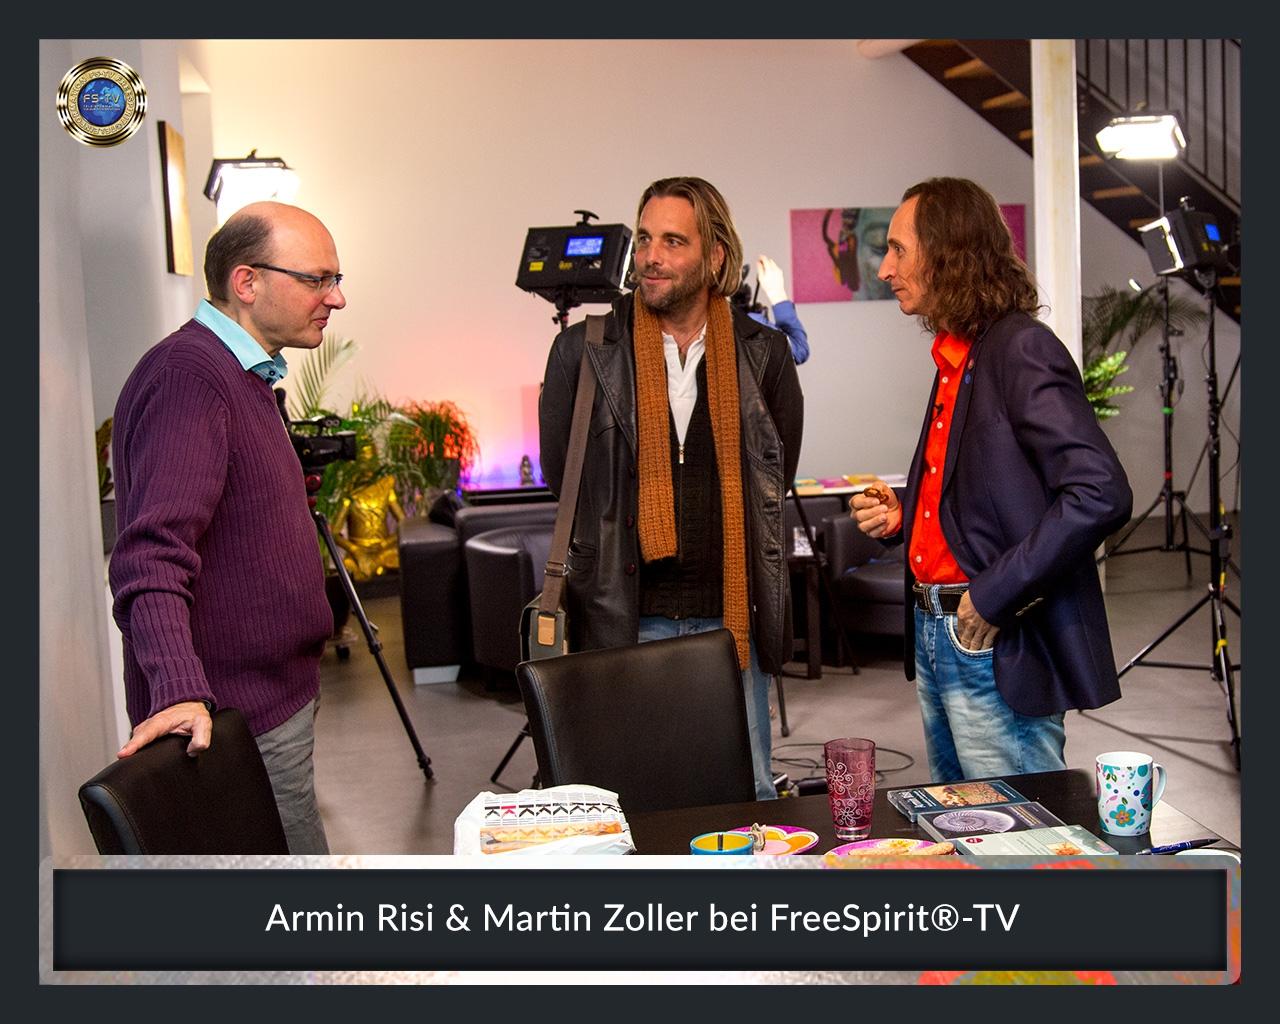 FS-TV-Bildergallerie-Armin-Risi-&-Martin-Zoller